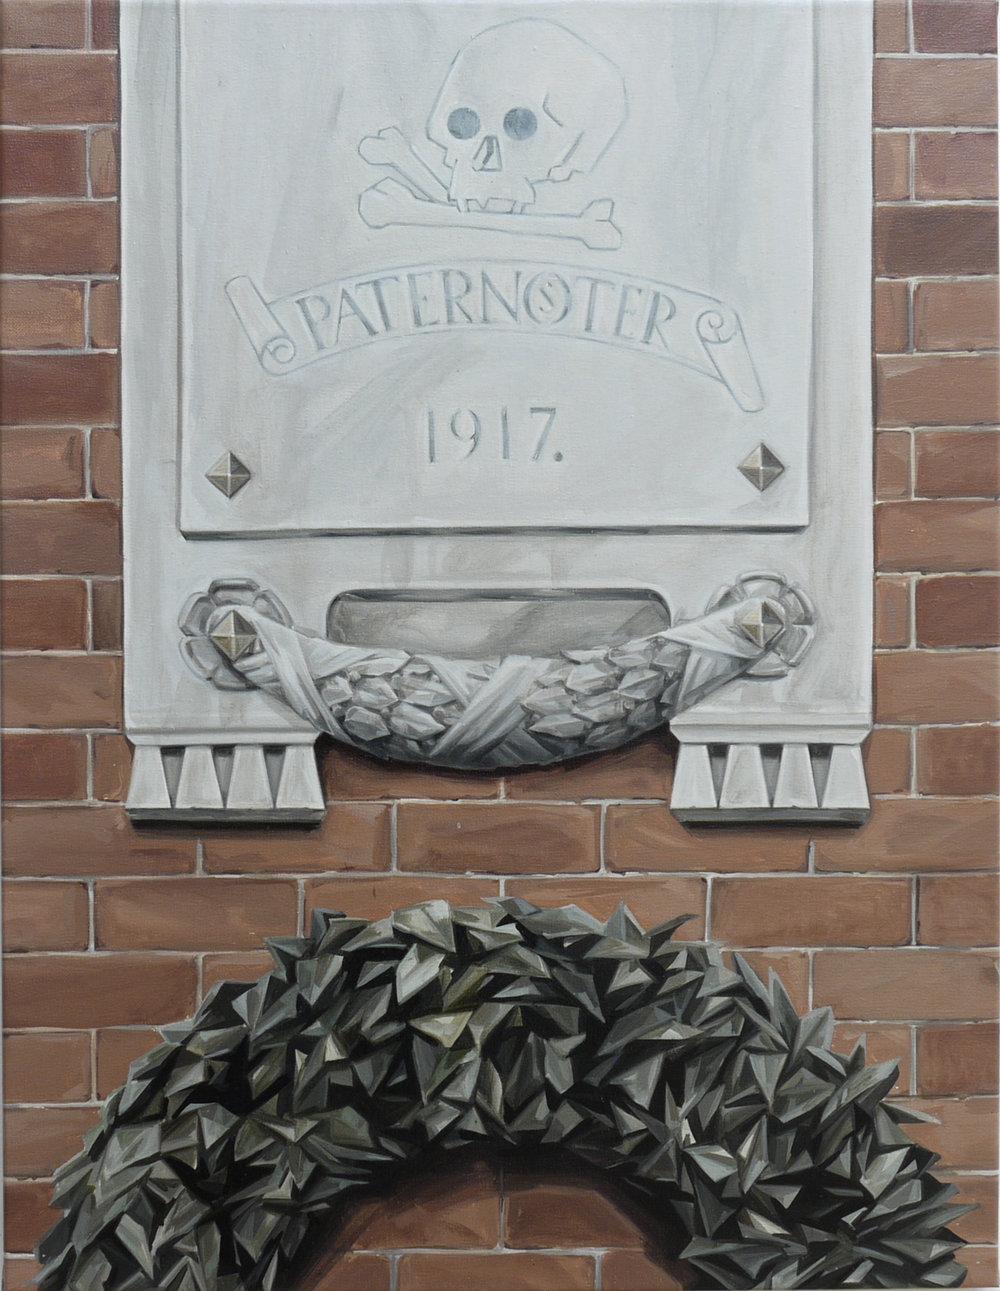 MJG_Paternoster 1917.jpg